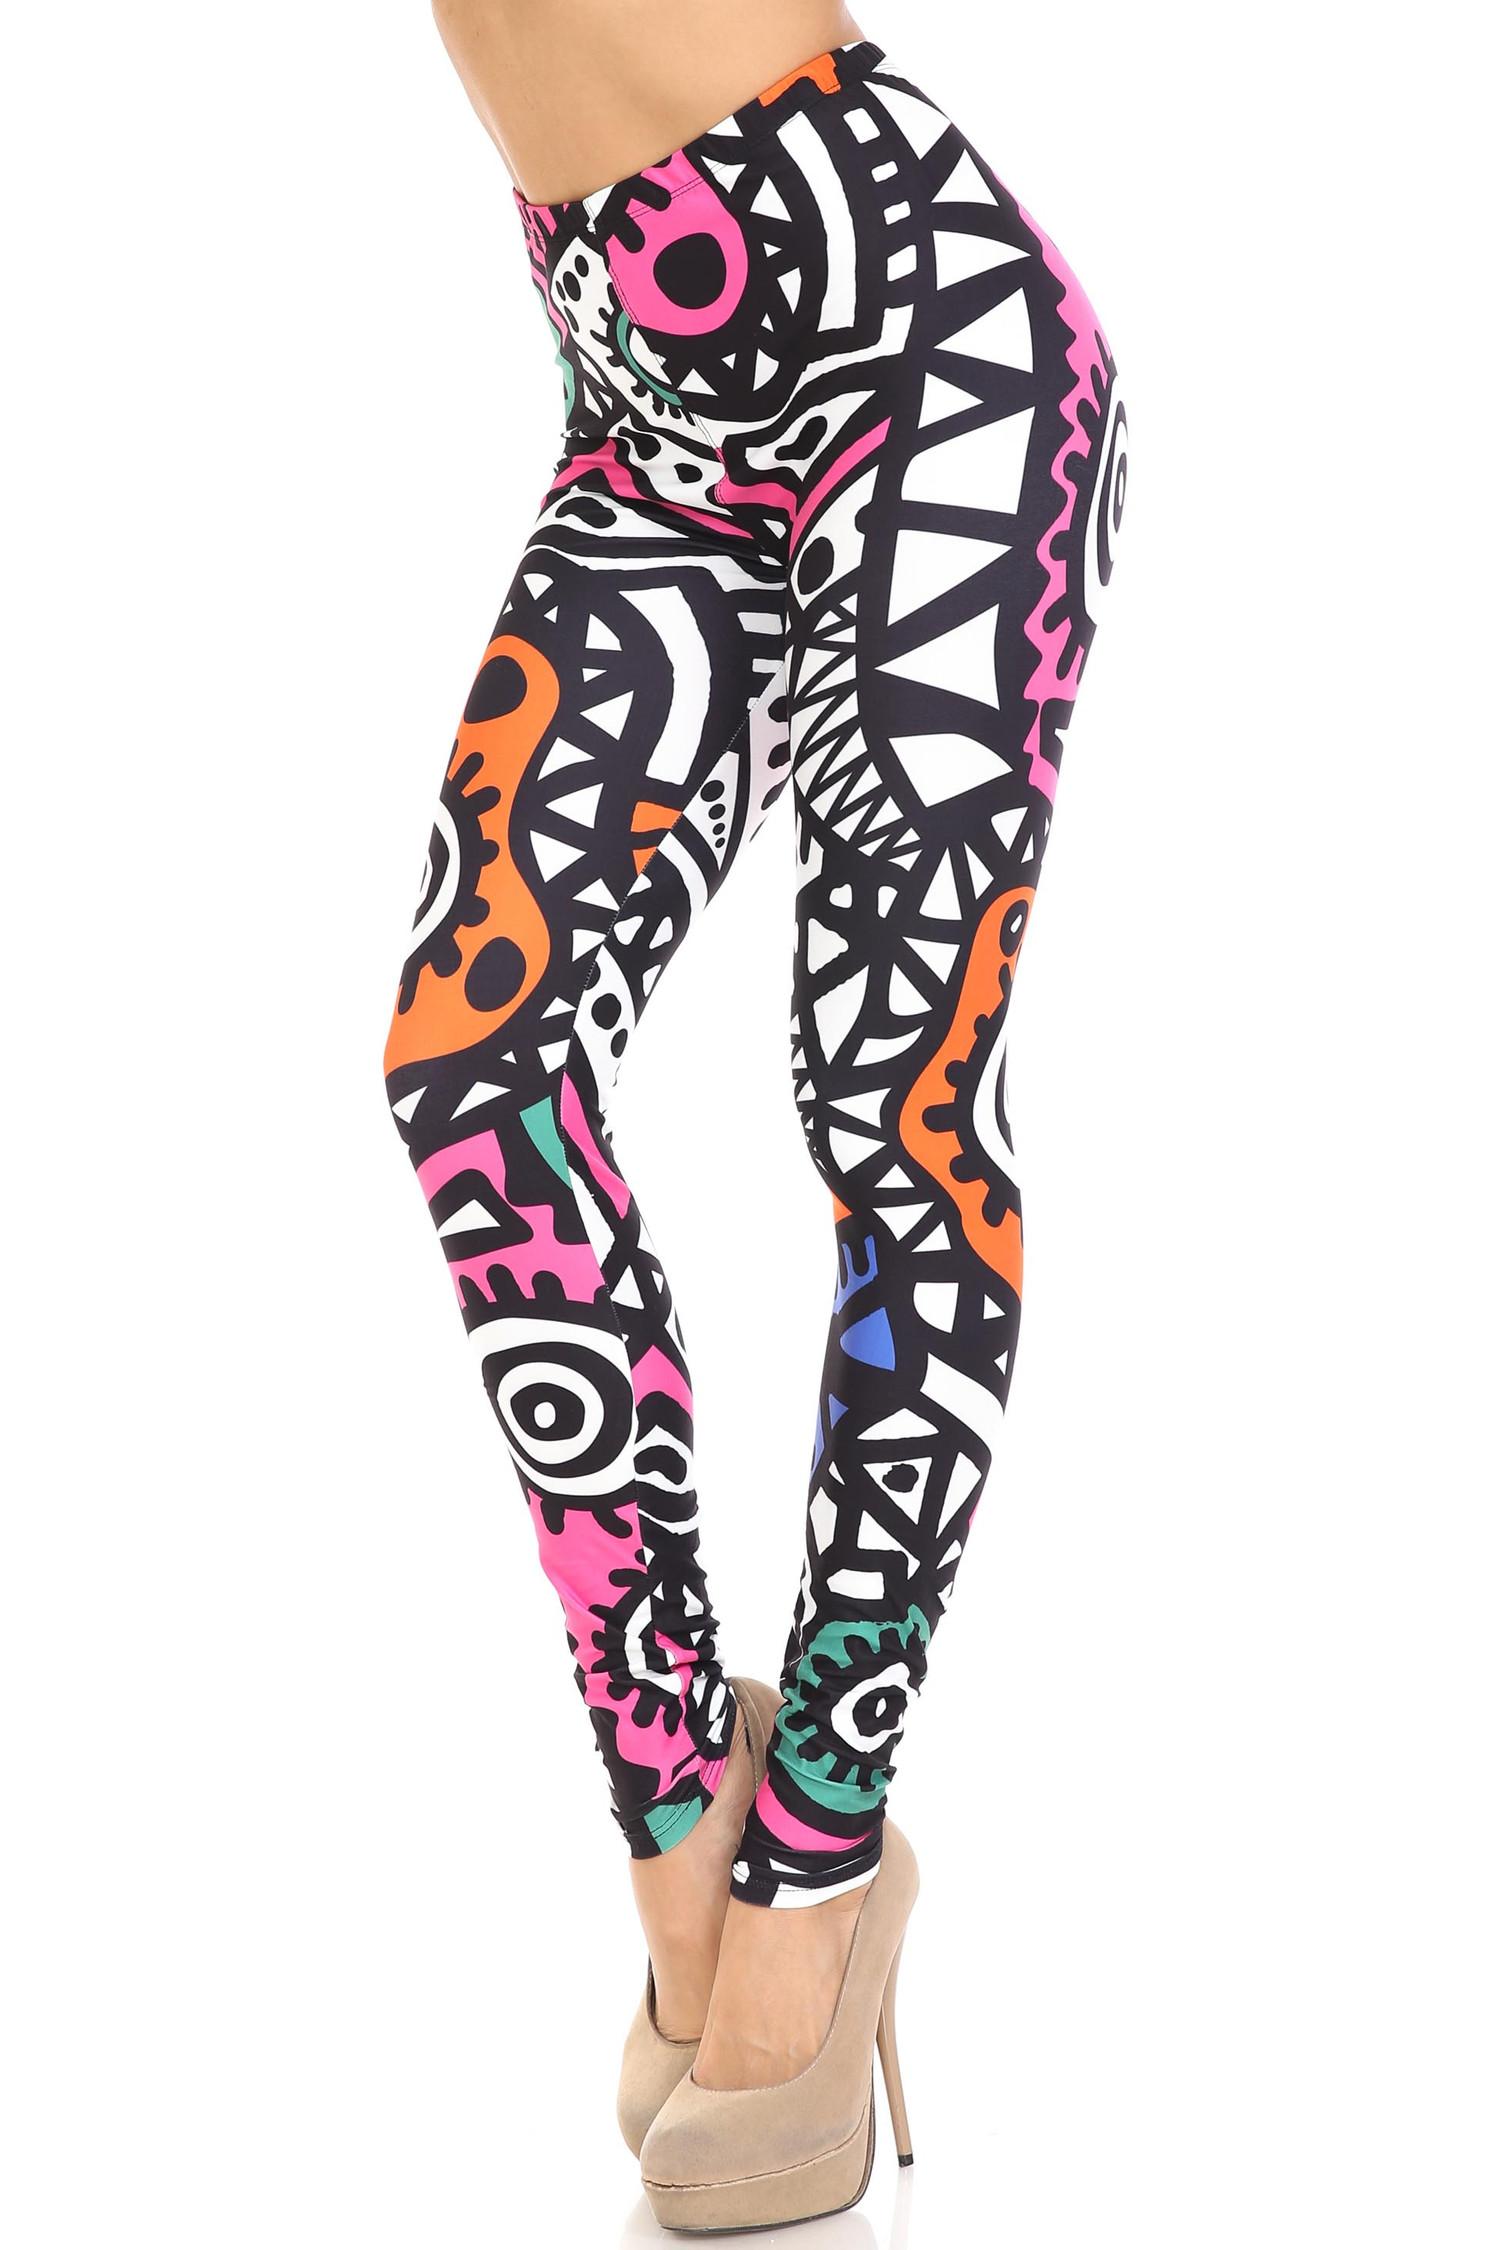 Creamy Soft Color Tribe Leggings - By USA Fashion™